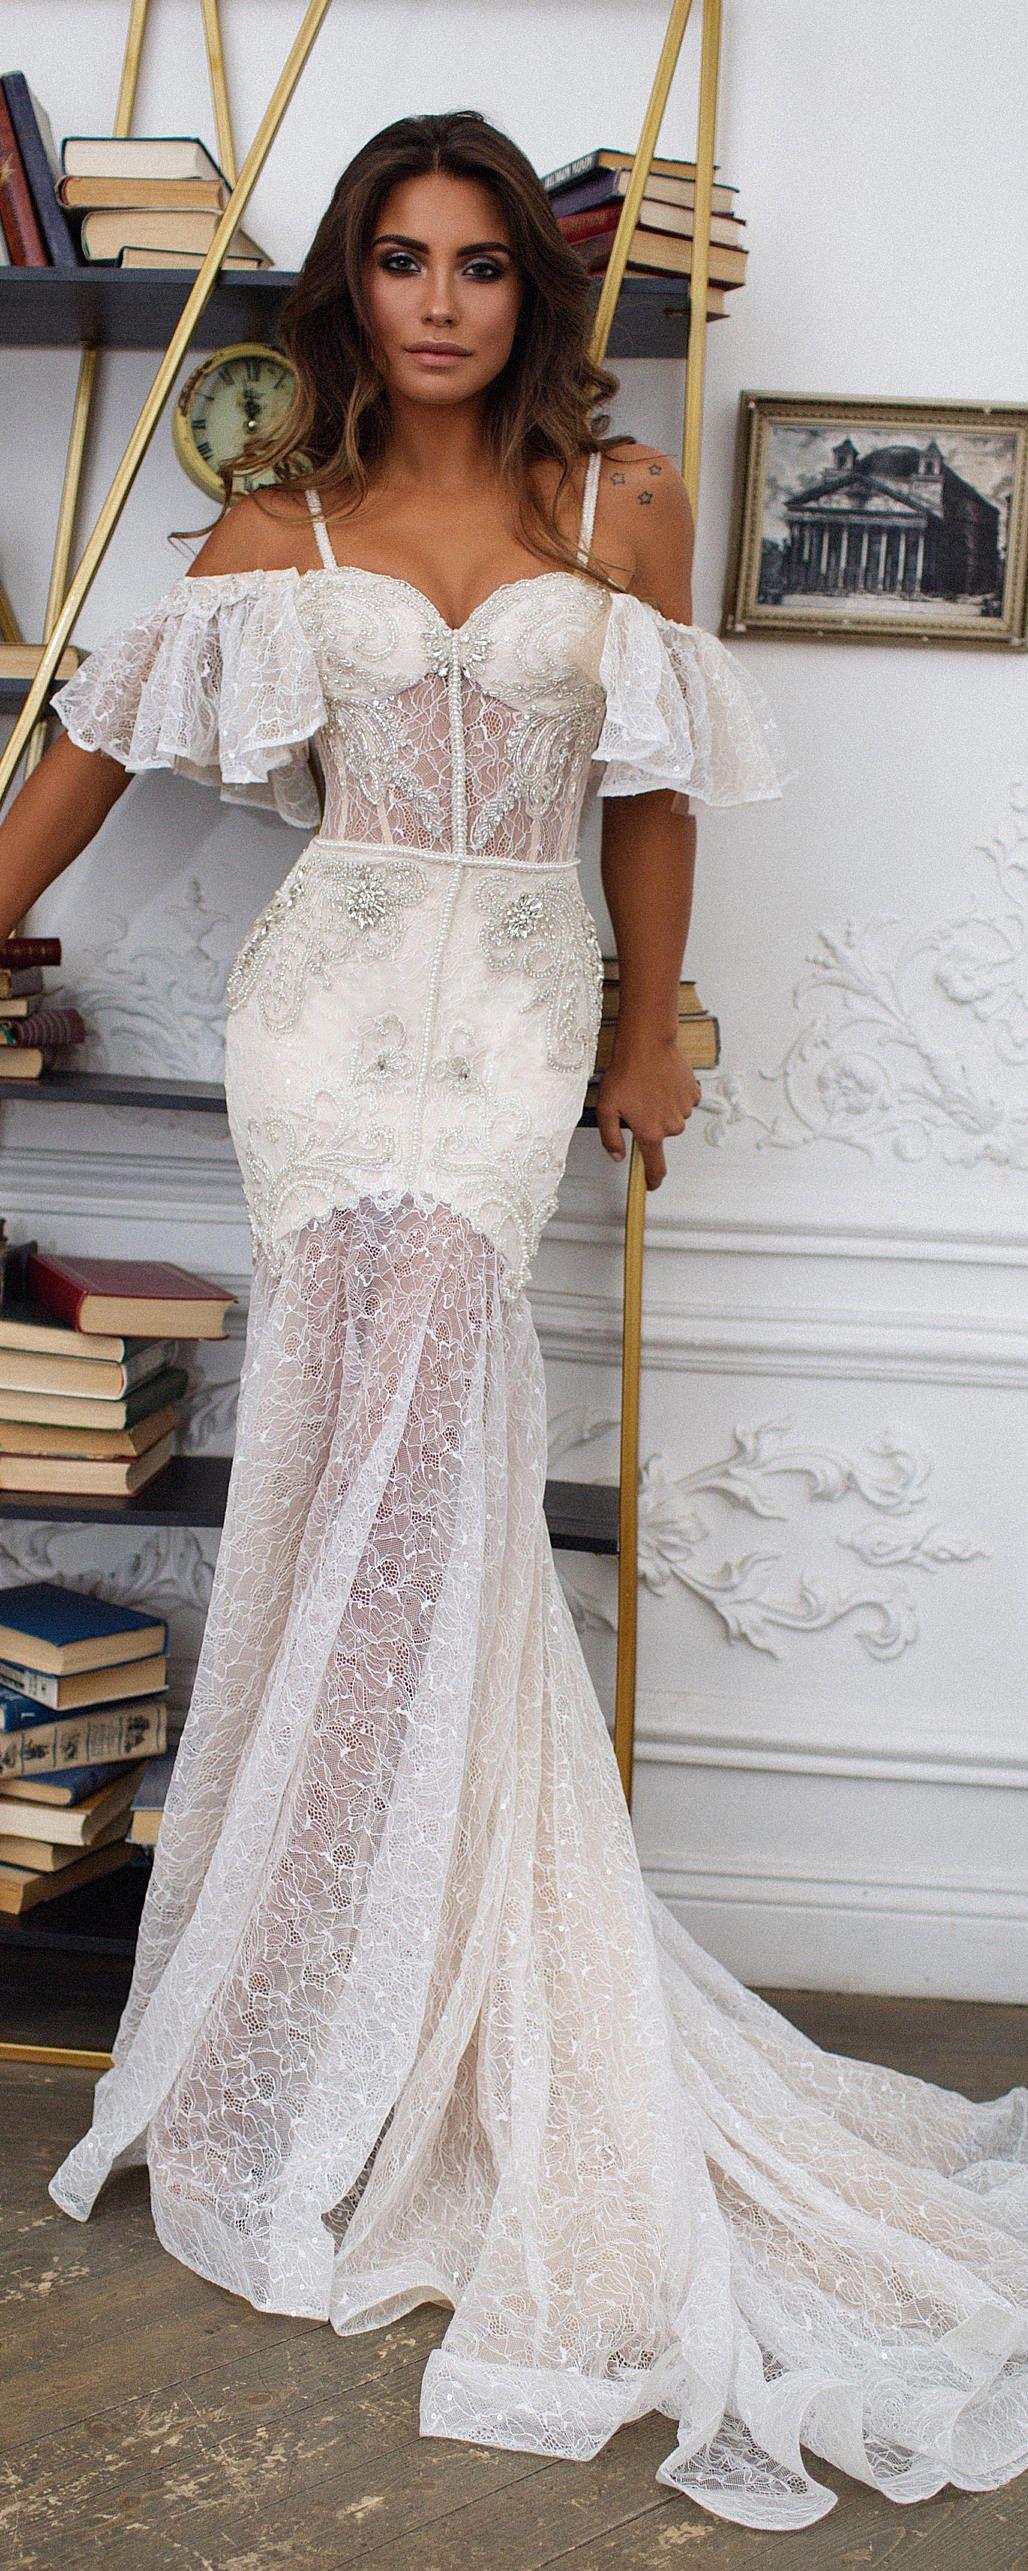 Bohemian wedding dress mermaid wedding dress seville off the